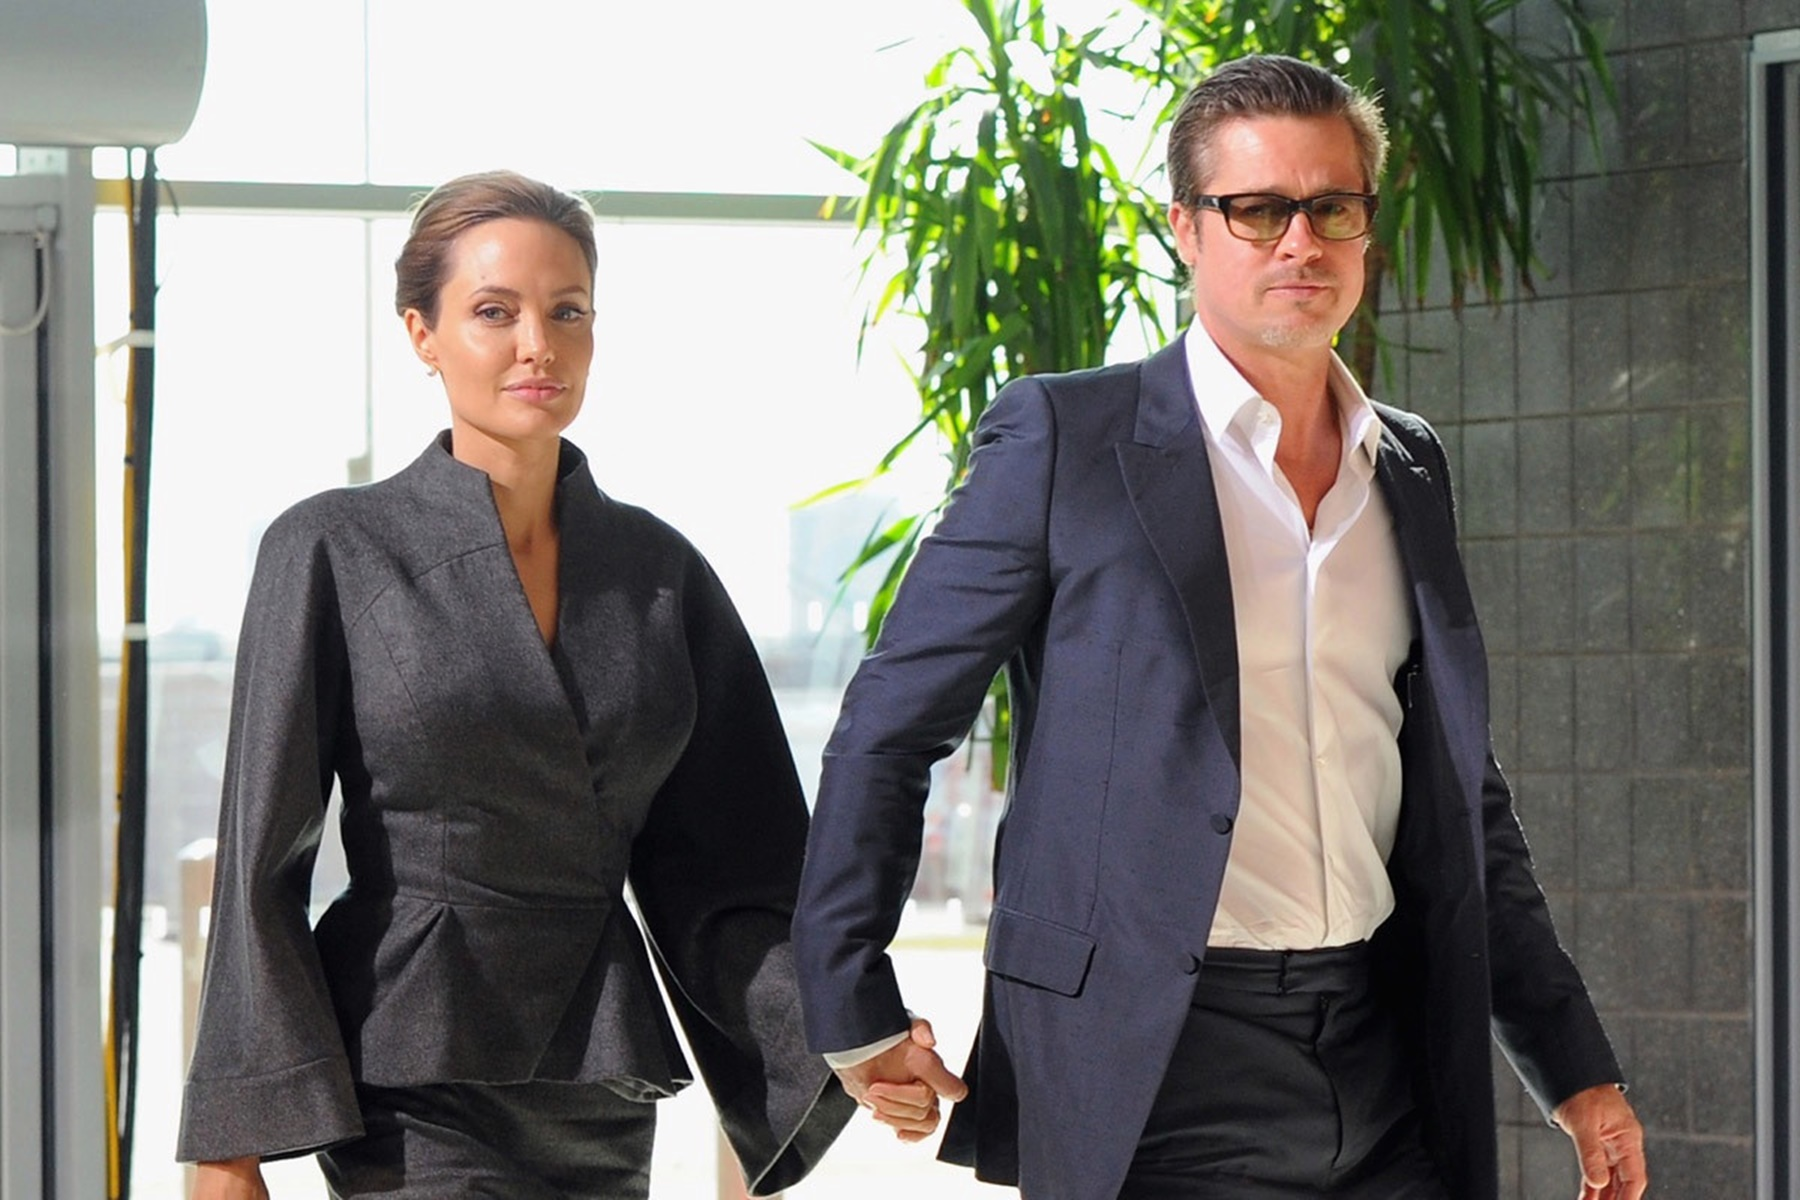 Brad Pitt New Girlfriend 2020 Brad Pitt Hopes To Go Public With His New Girlfriend — He Wants